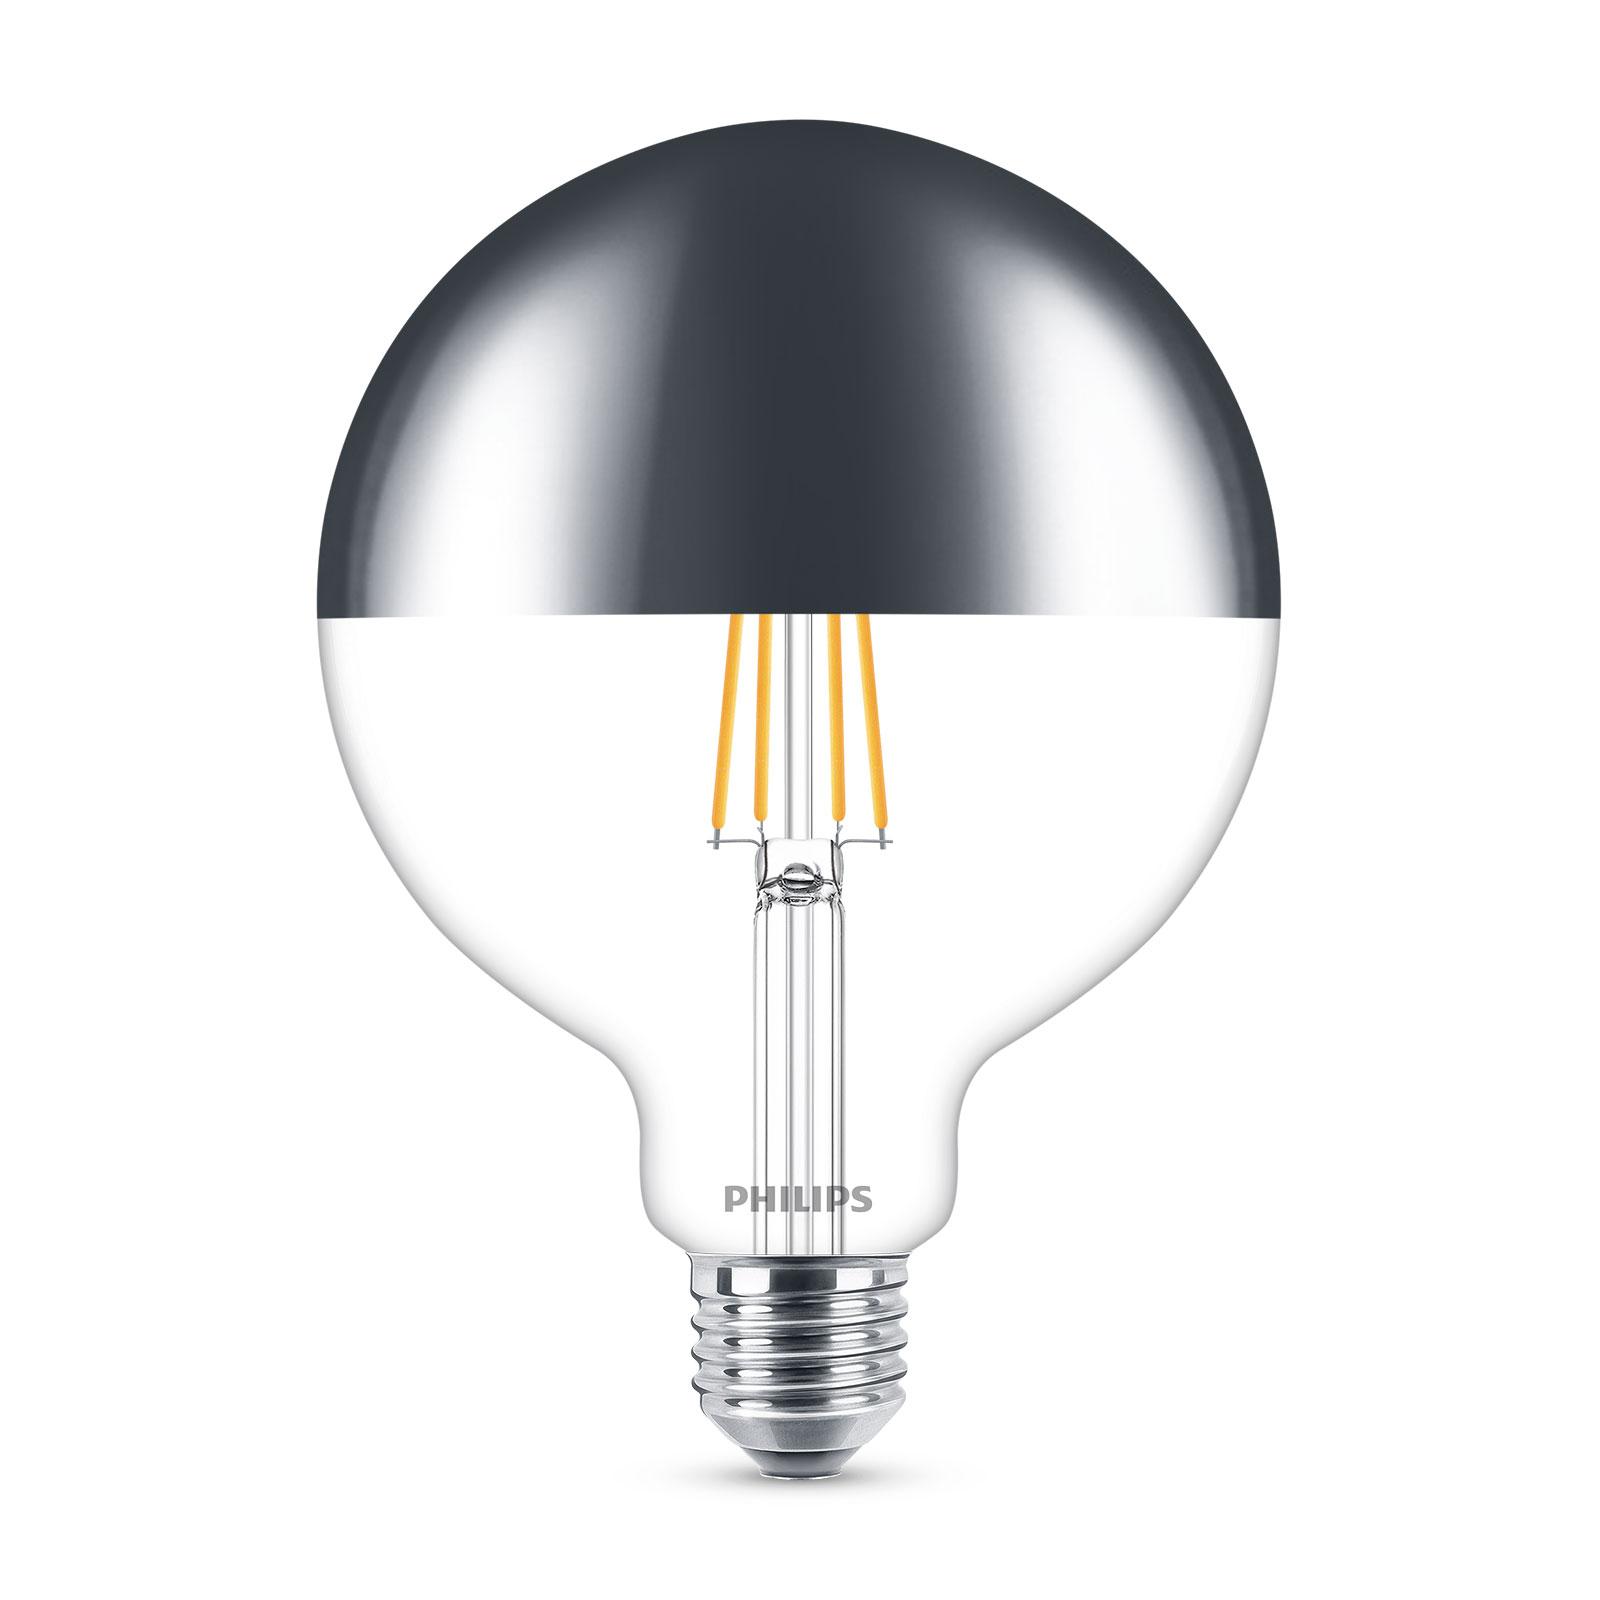 Philips żarówka globe kulista LED E27 G120 lustro